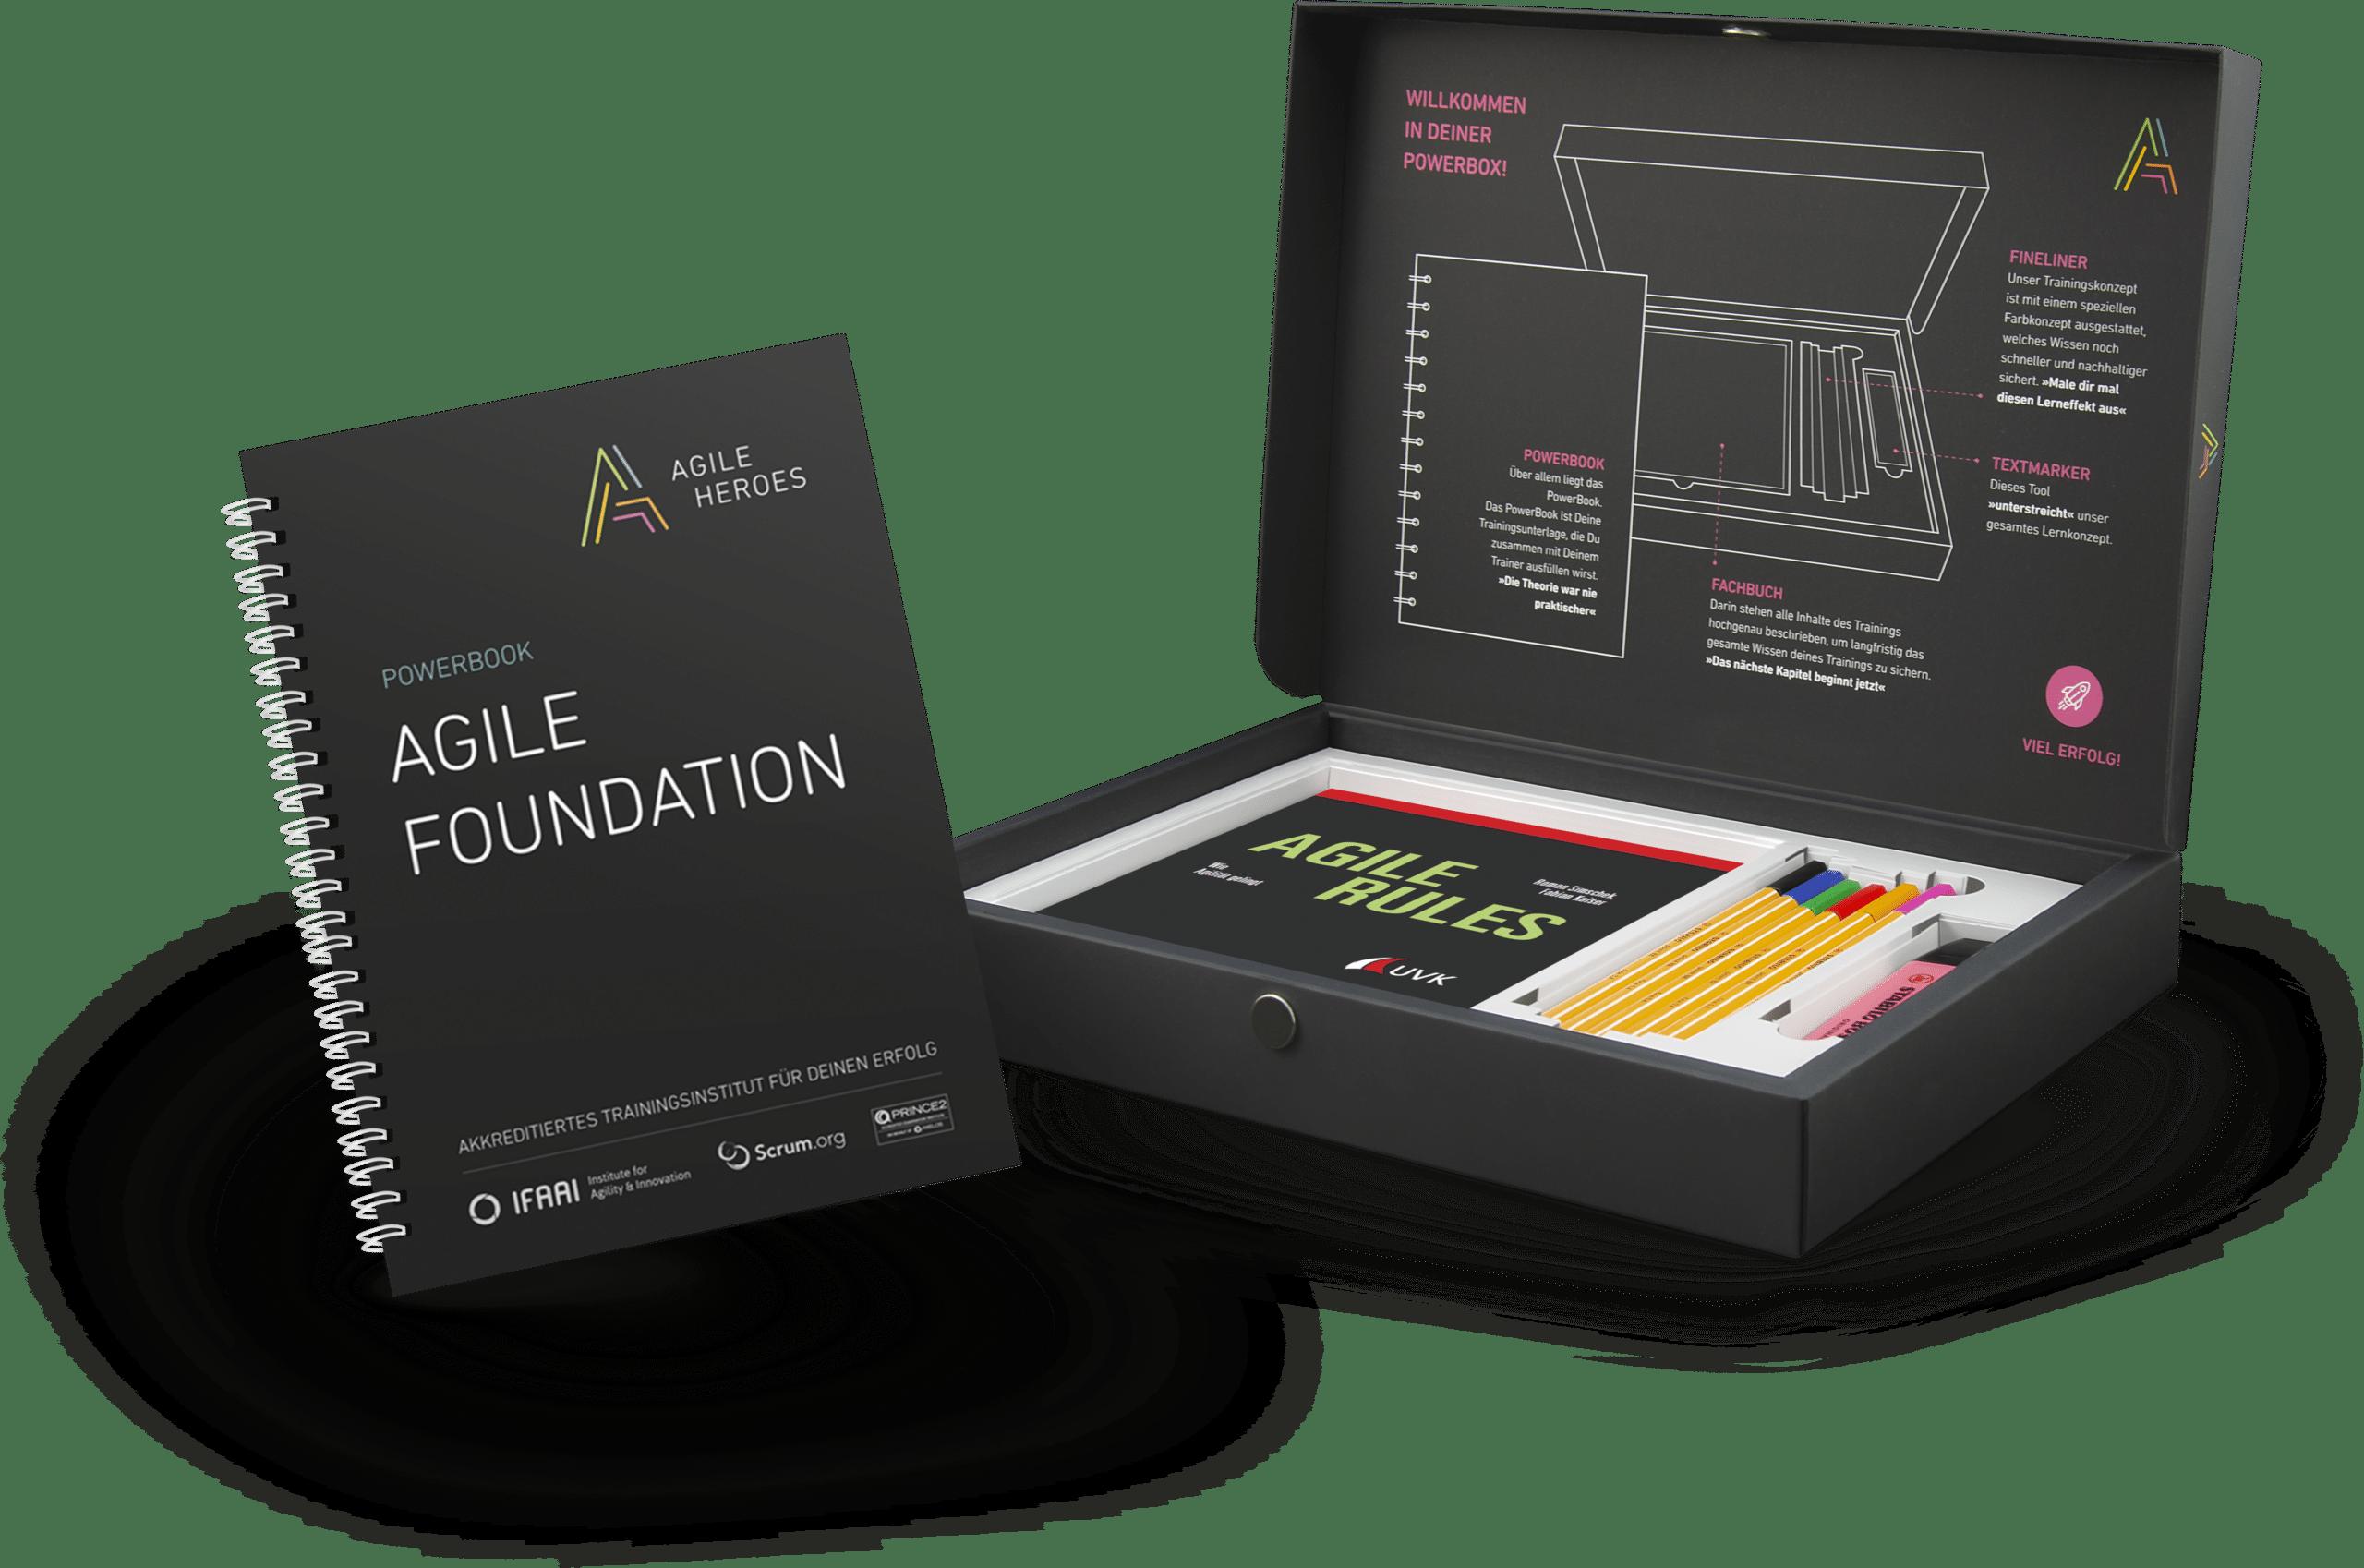 Agile Foundation Powerbox